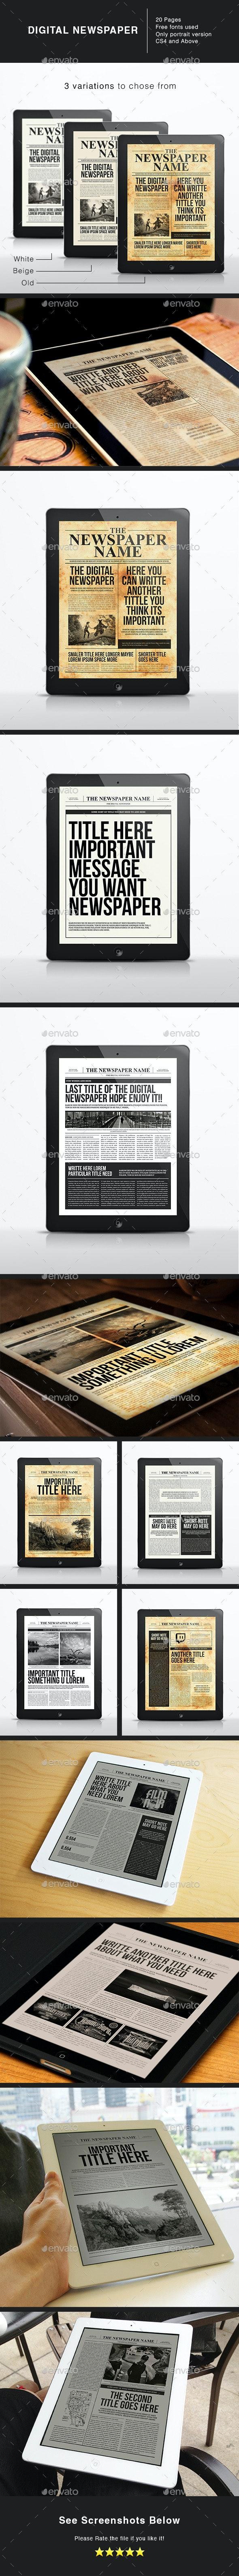 The Digital Newspaper Template - Digital Magazines ePublishing